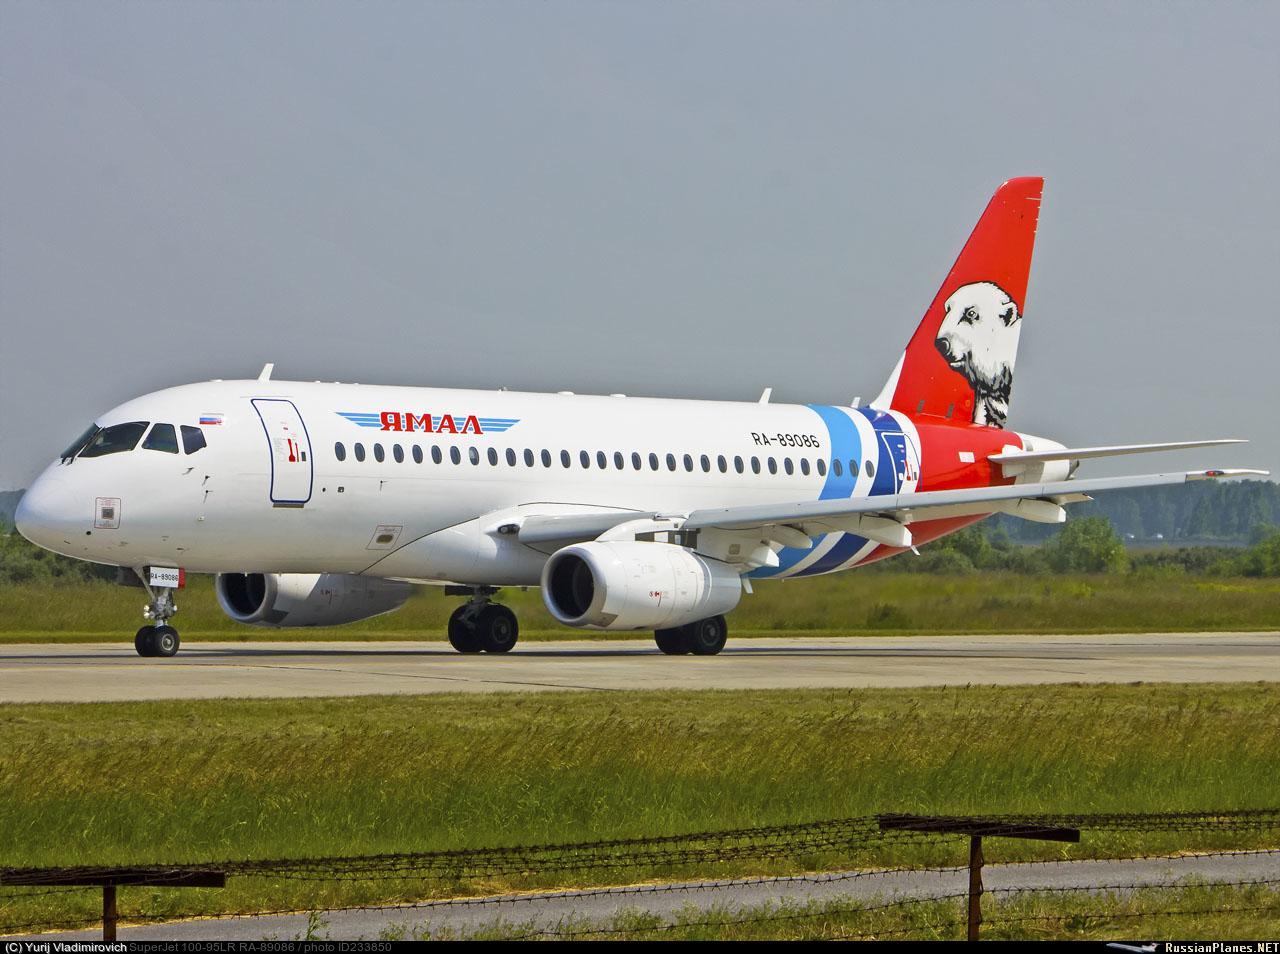 Sukhoi Superjet-100 RA-89086 (95125)